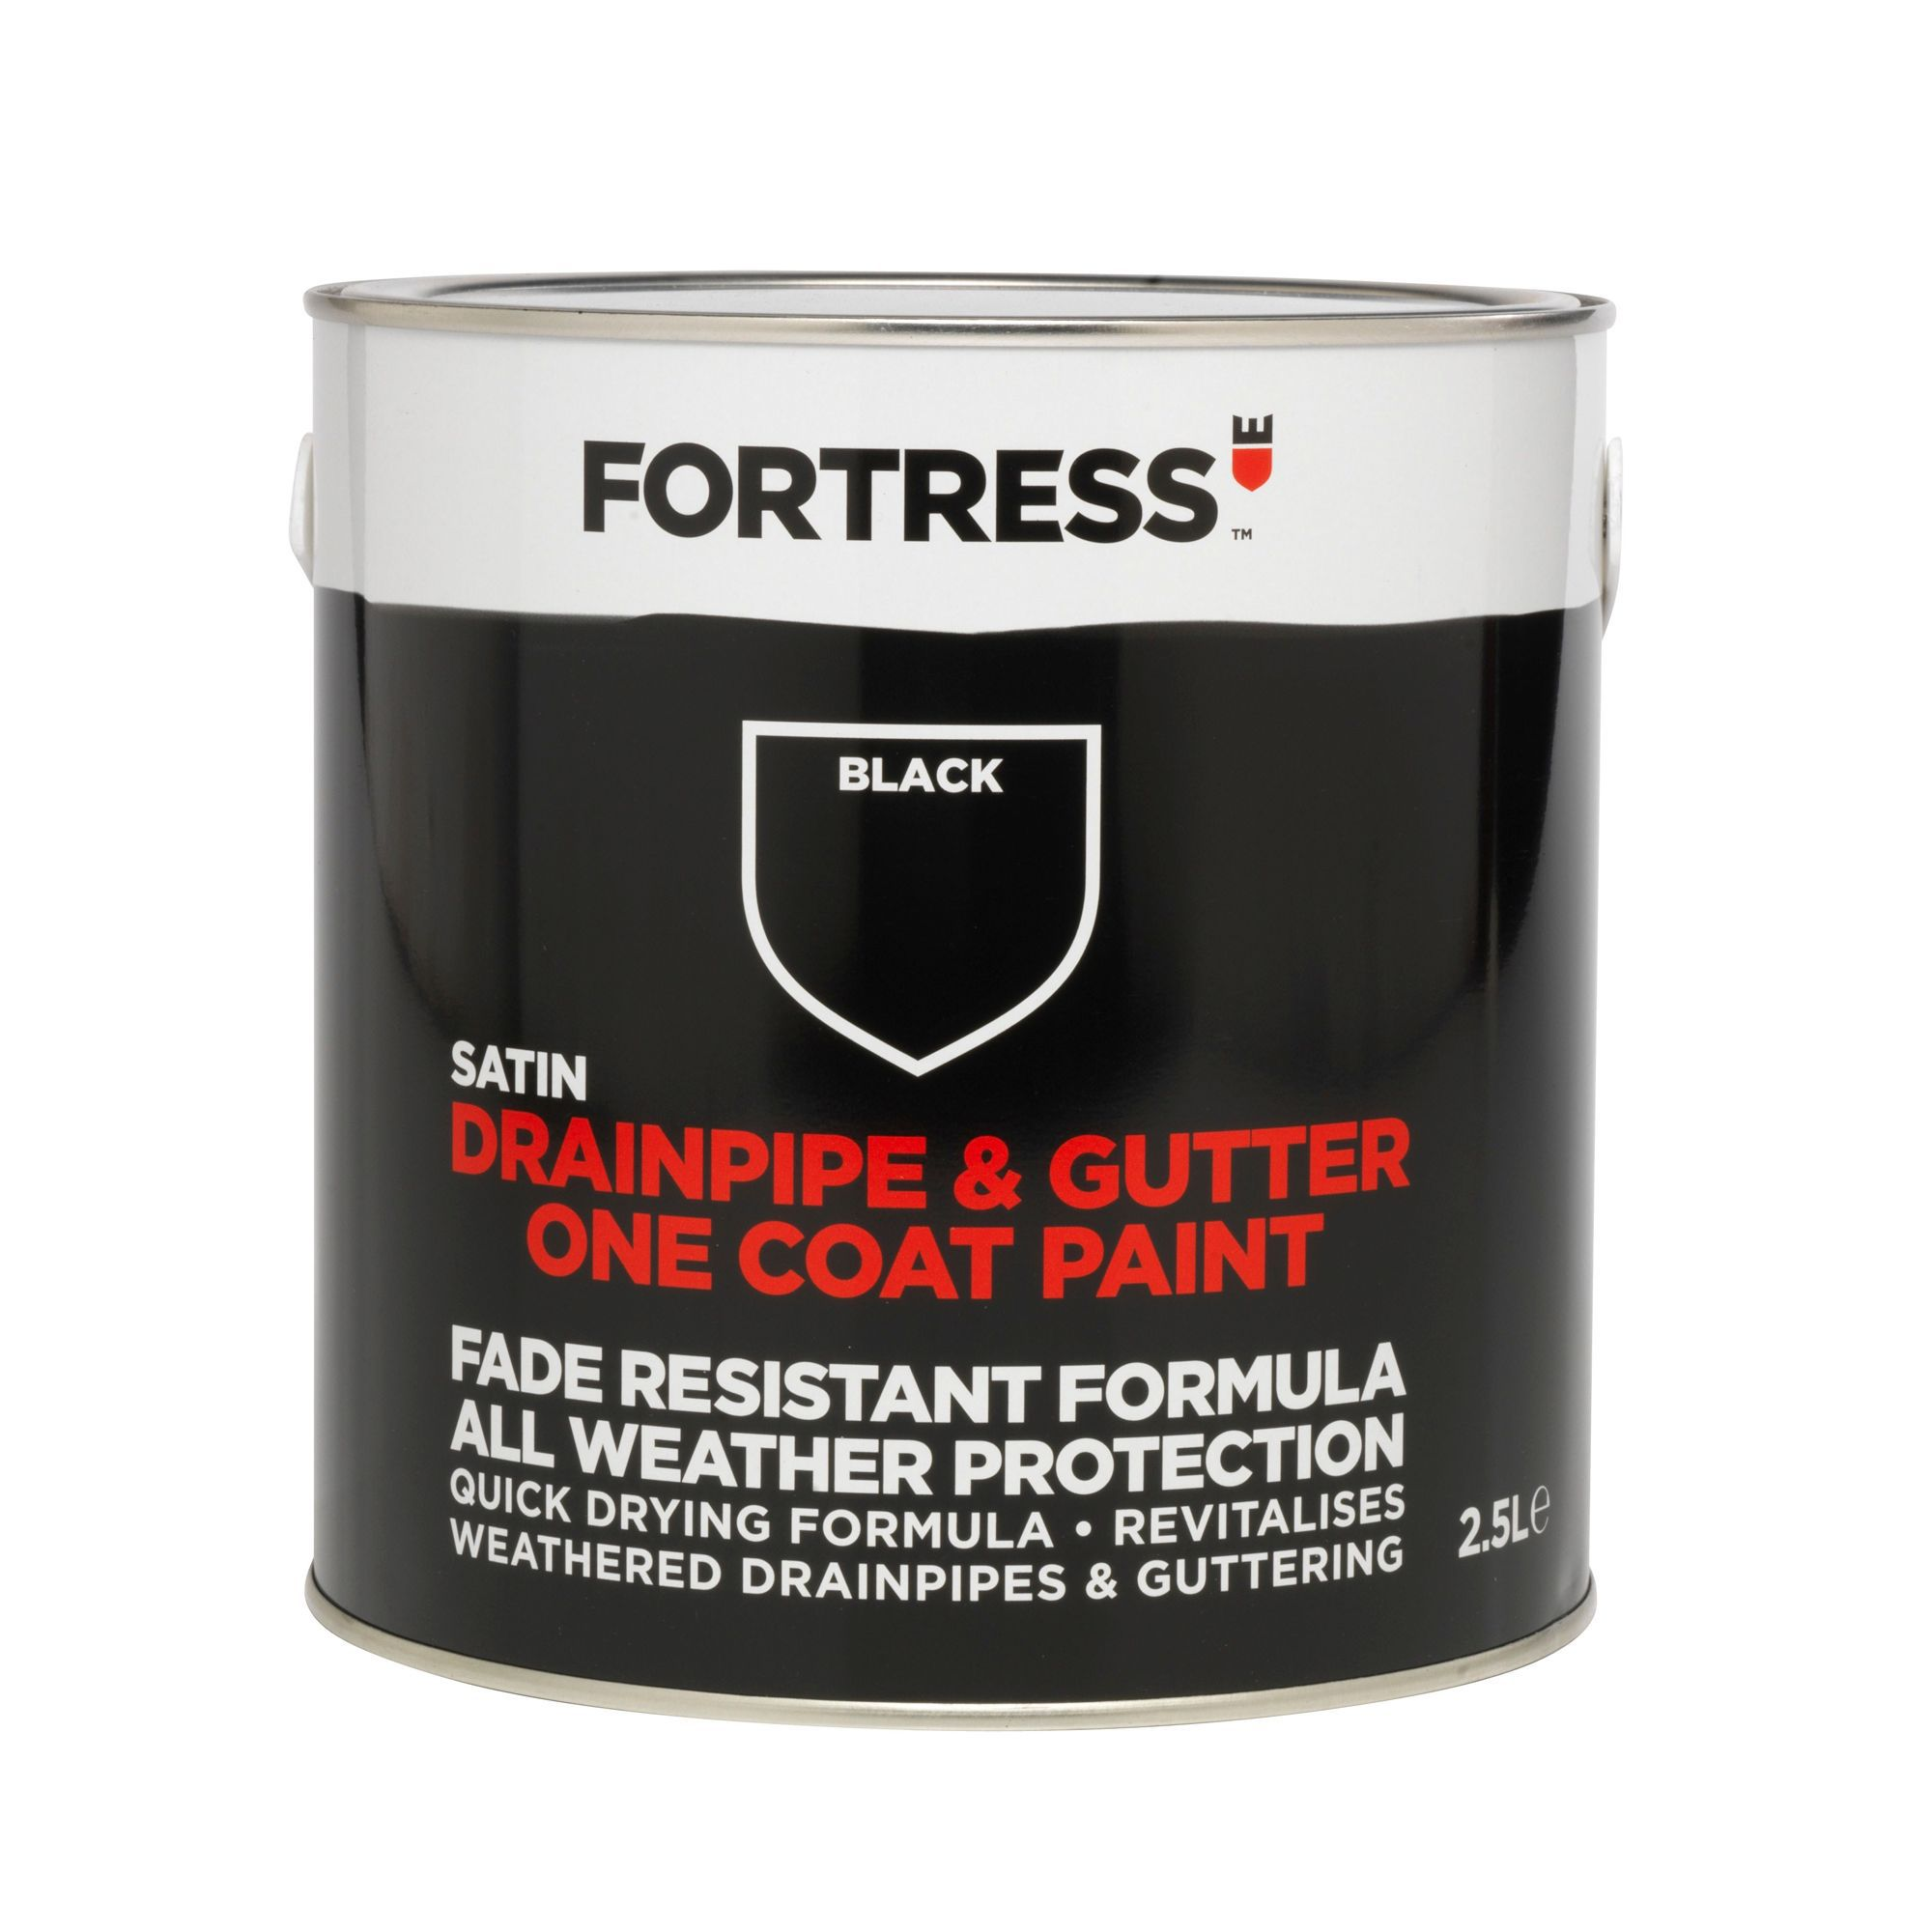 Fortress Black Paint